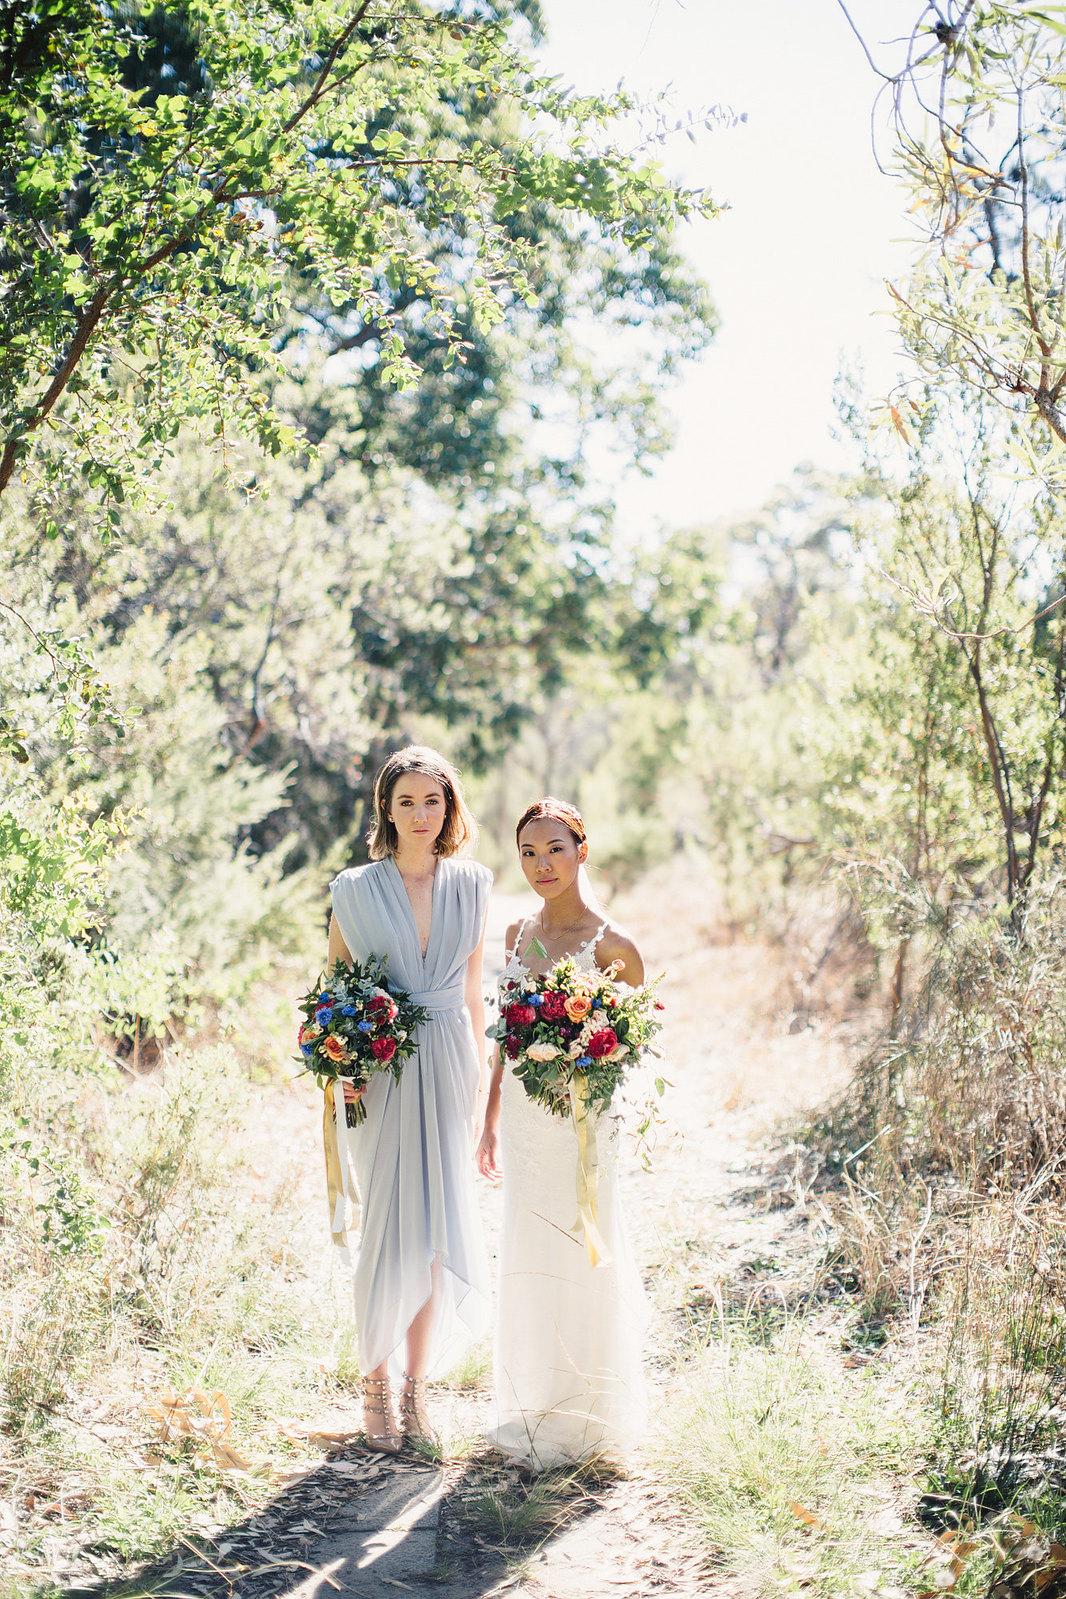 Natasja Kremers Trish's Wedding